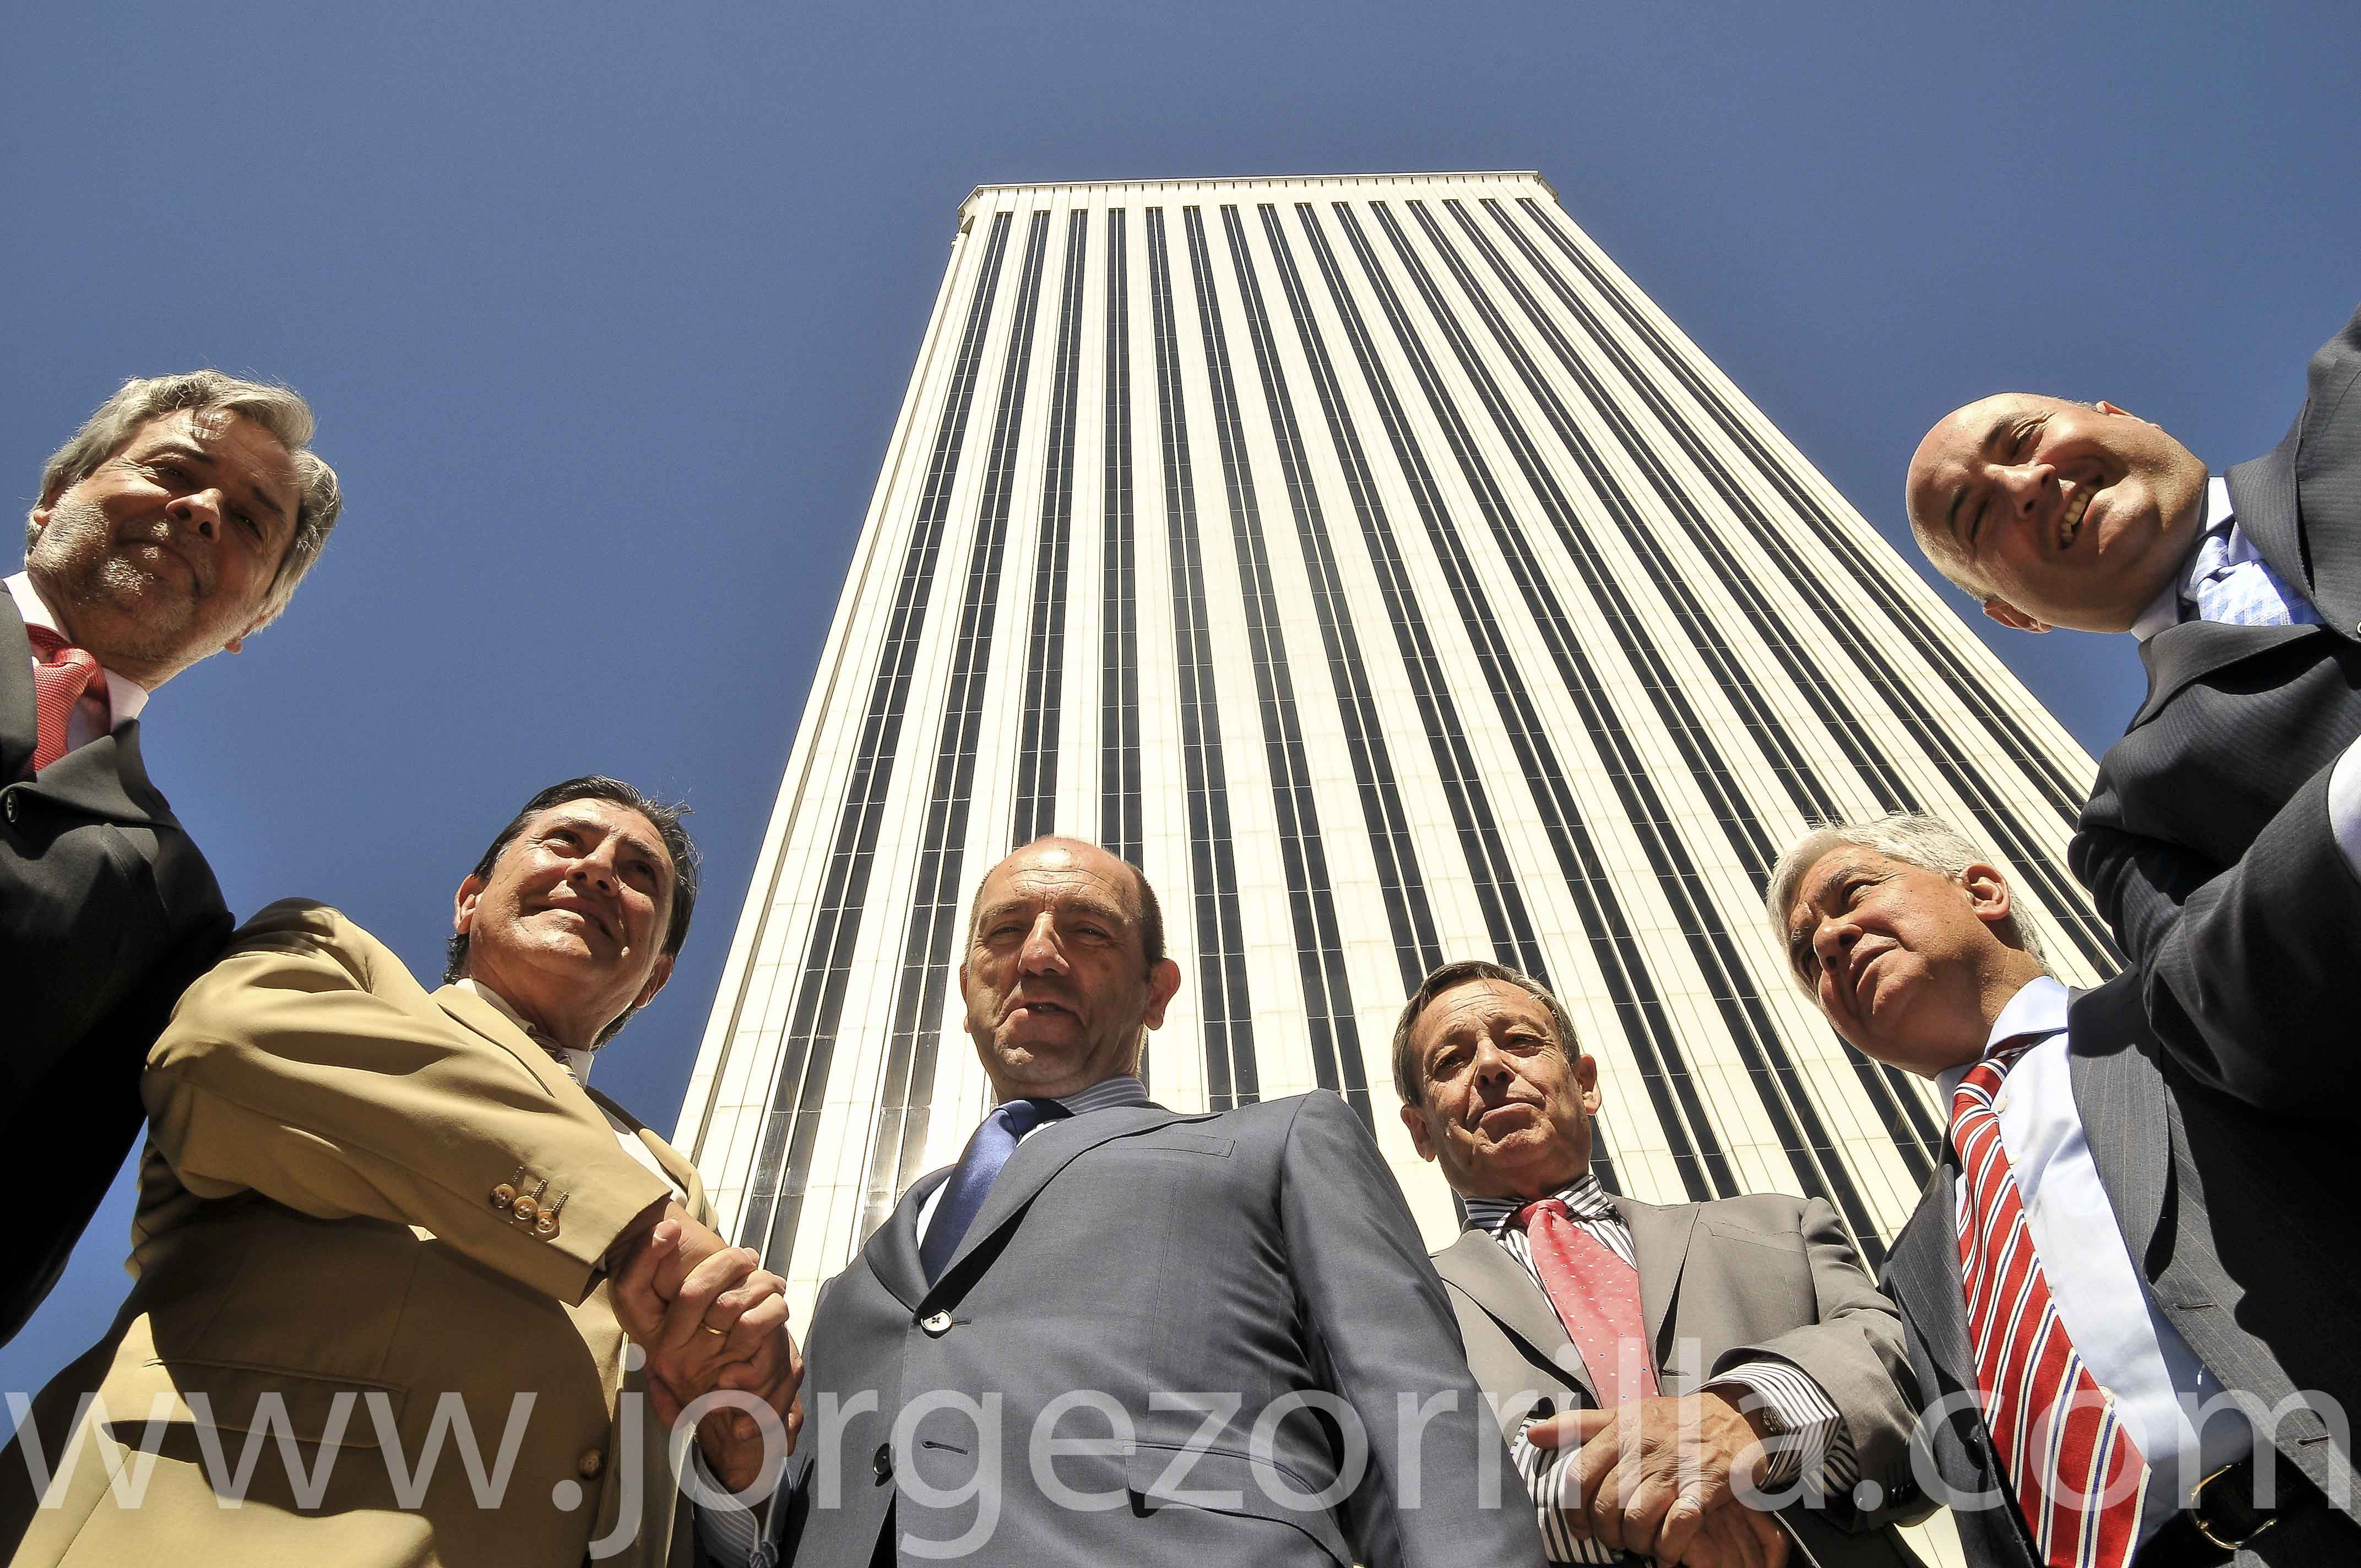 Fotografía Directivos Fcc © Jorge Zorrilla Fotógrafo Madrid